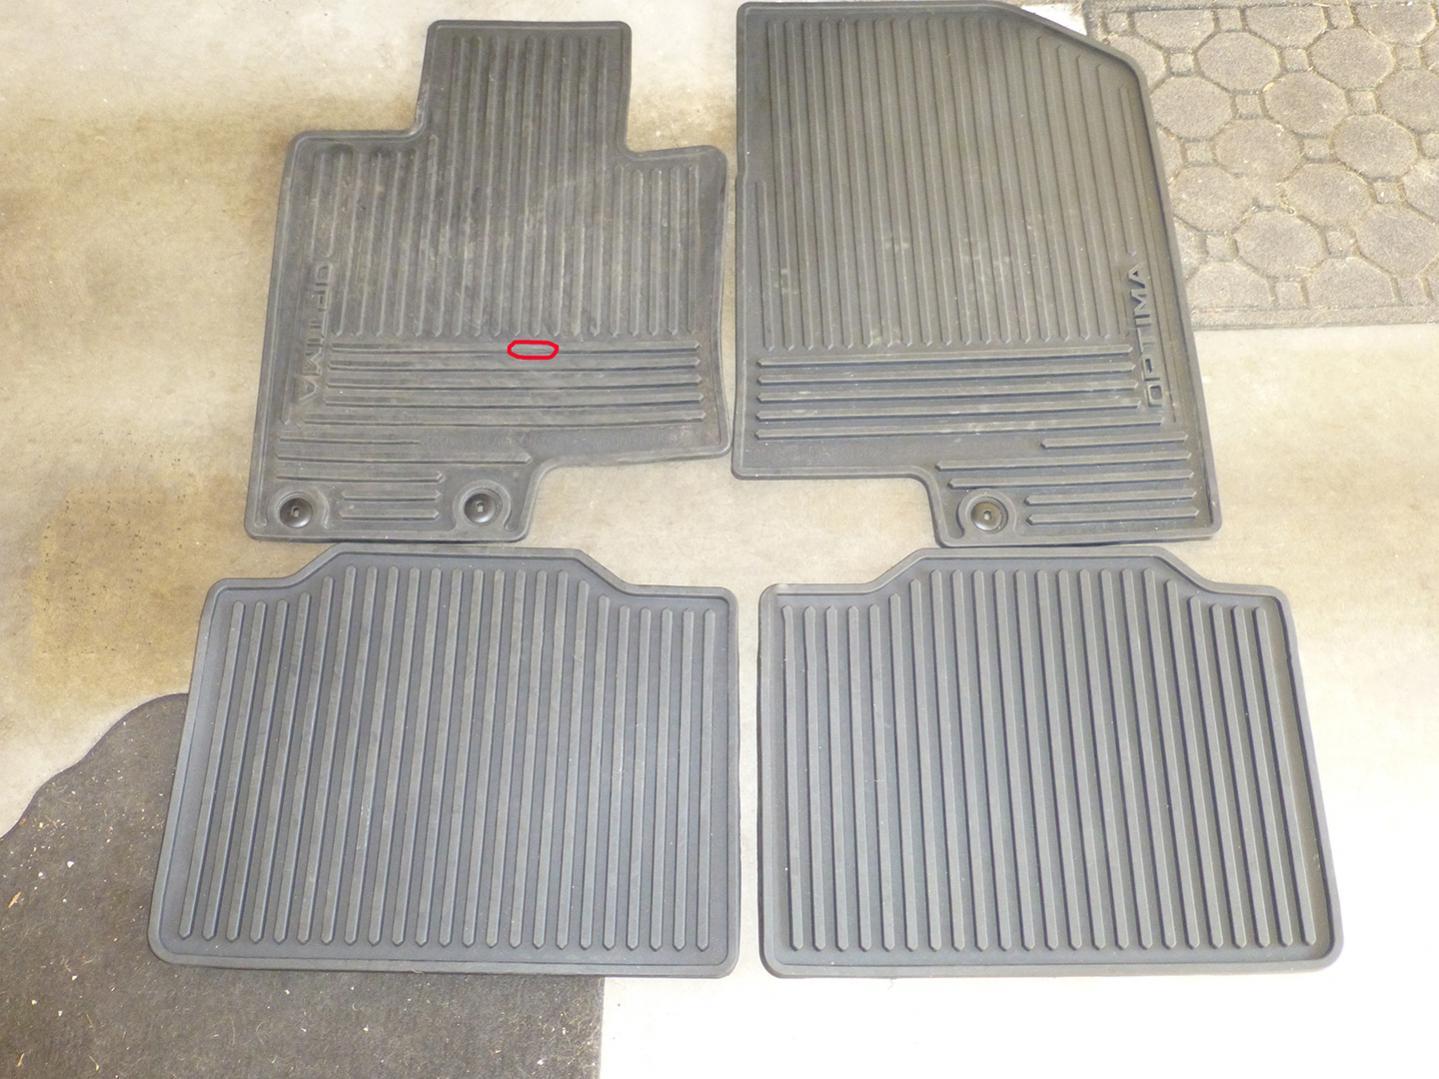 Floor mats used - Kia Rubber Floor Mats Black 2011 Optima Used 00 Plus Shipping P1000128